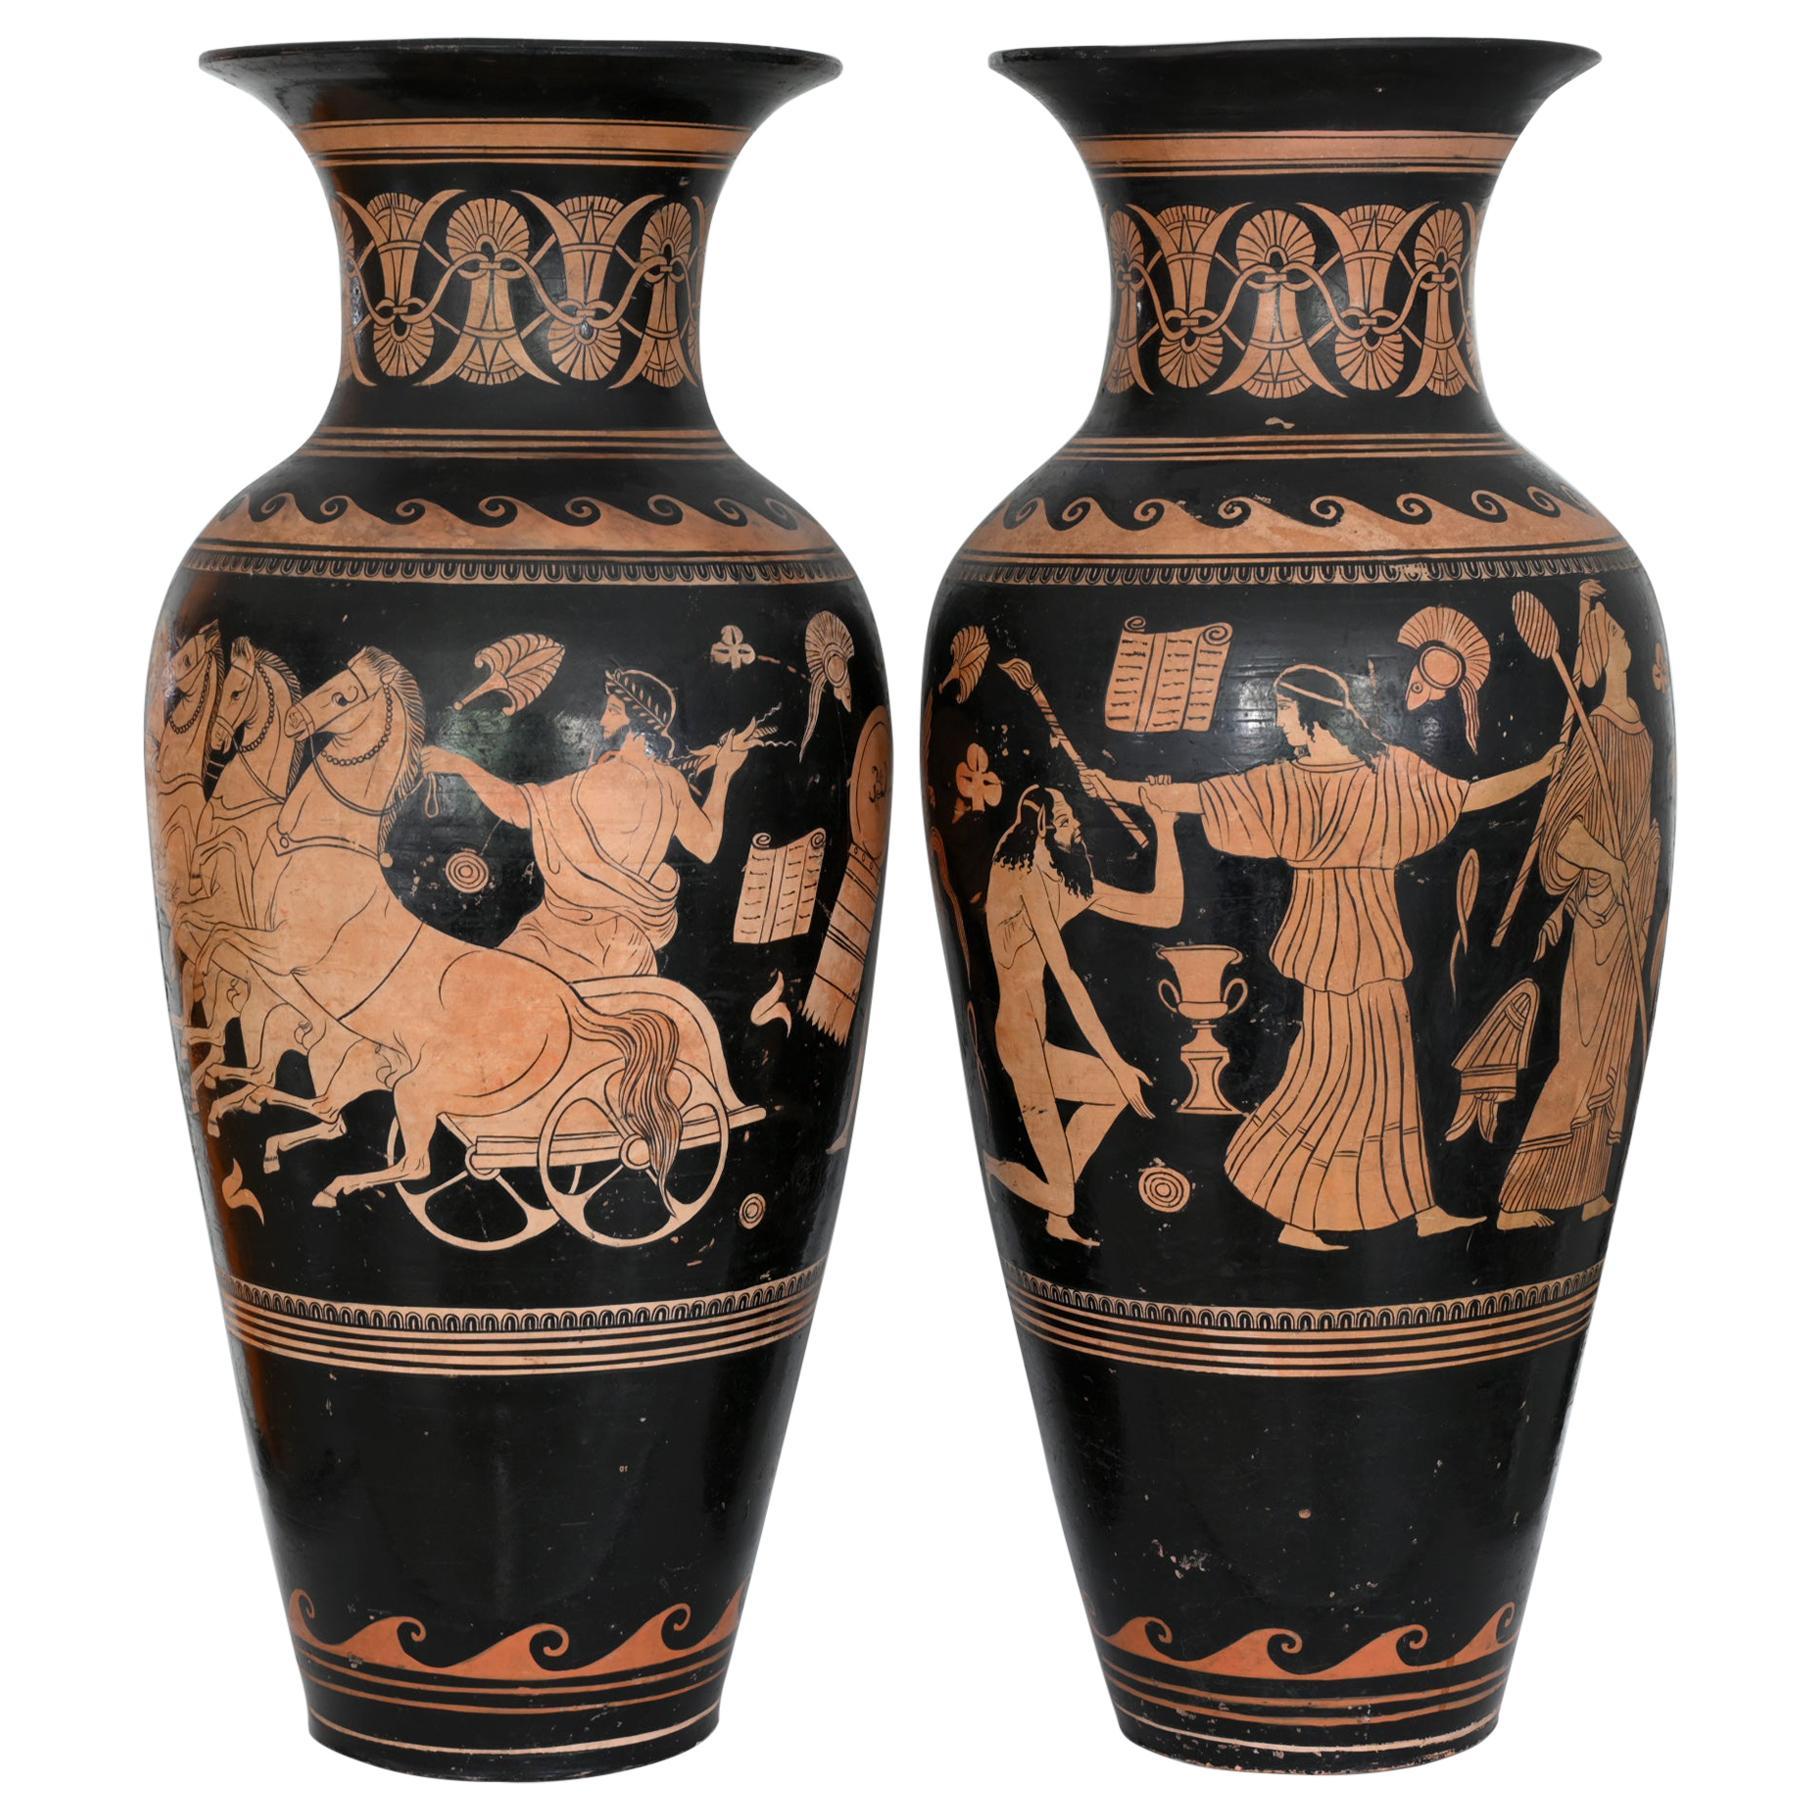 Pair of Red-Figure Black-Ground Vases, 1810-1850, Italy, Terracotta, Grand Tour